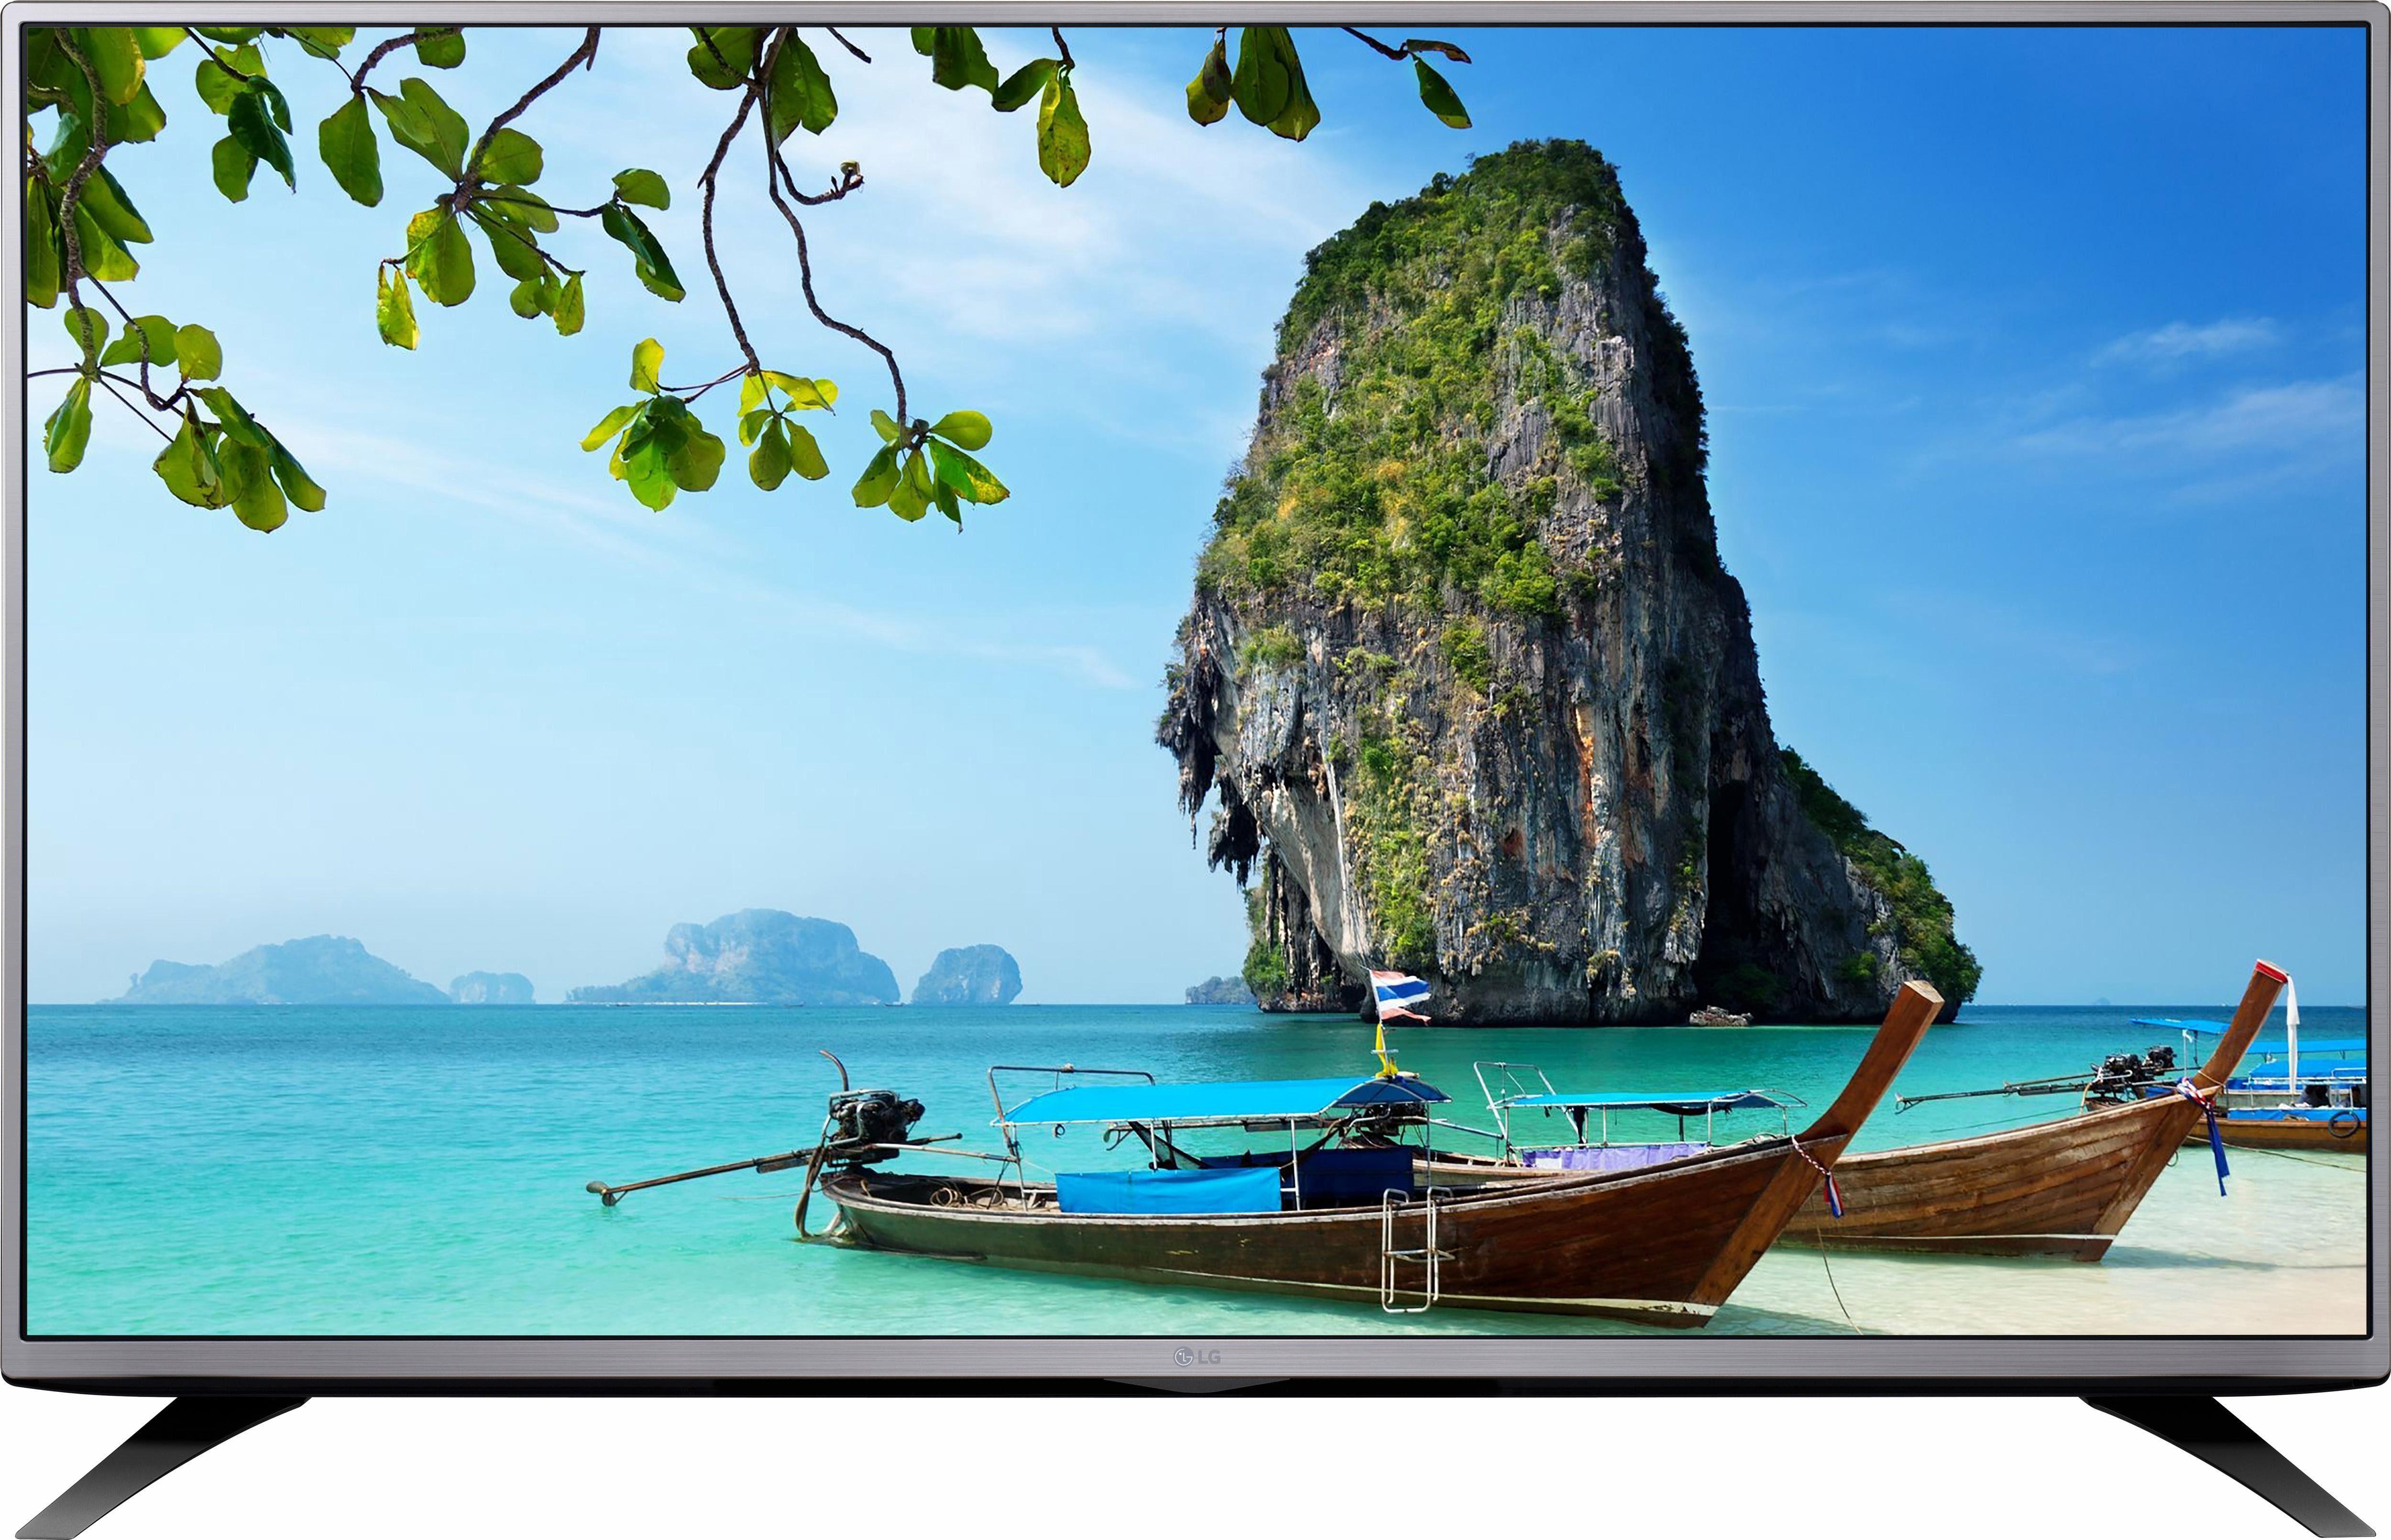 LG 49LH541V, LED Fernseher, 123 cm (49 Zoll), 1080p (Full HD)